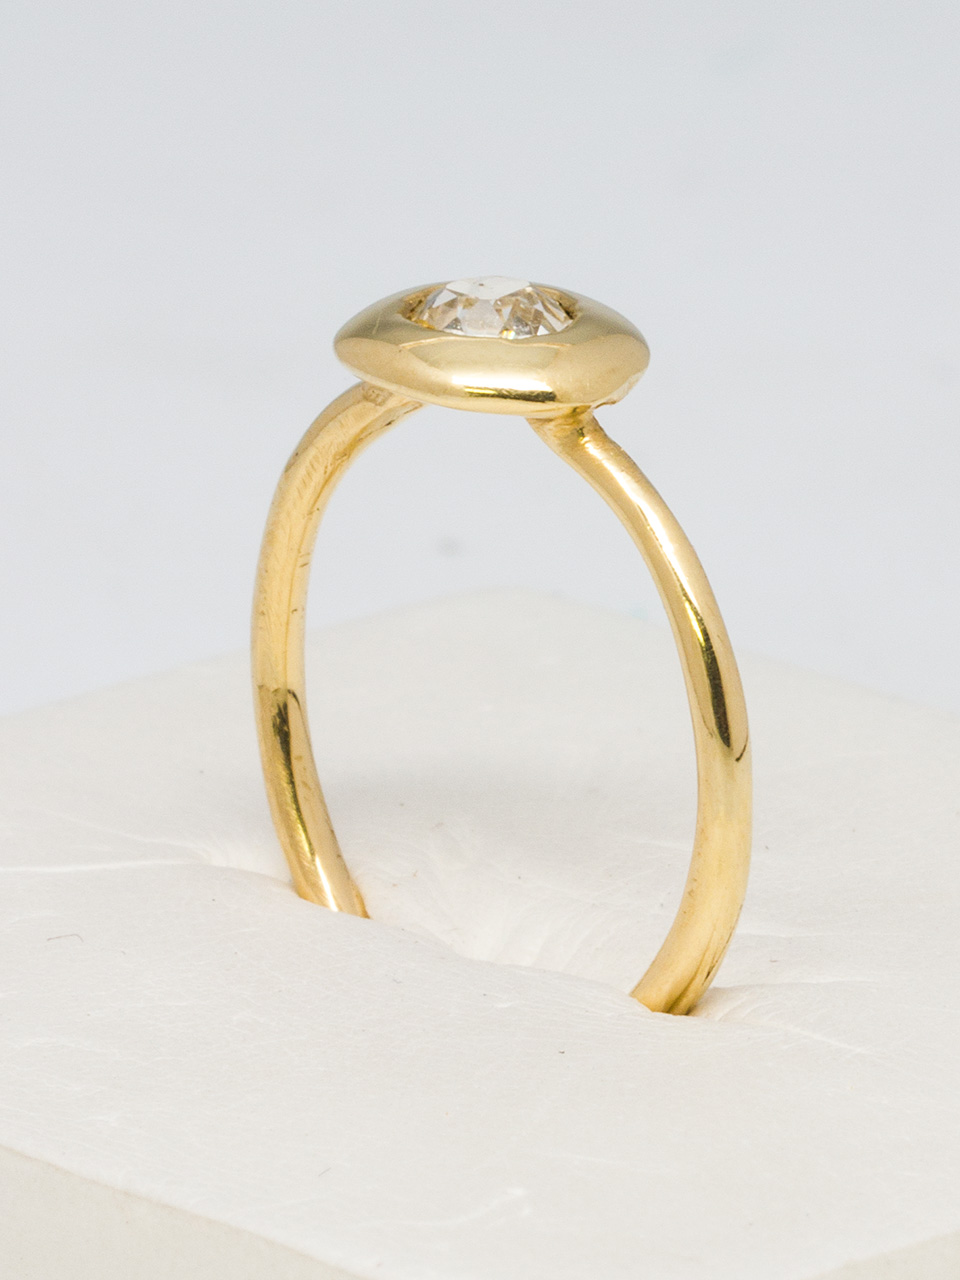 14k Yellow Gold Mine Cut Diamond Ring by Liza S